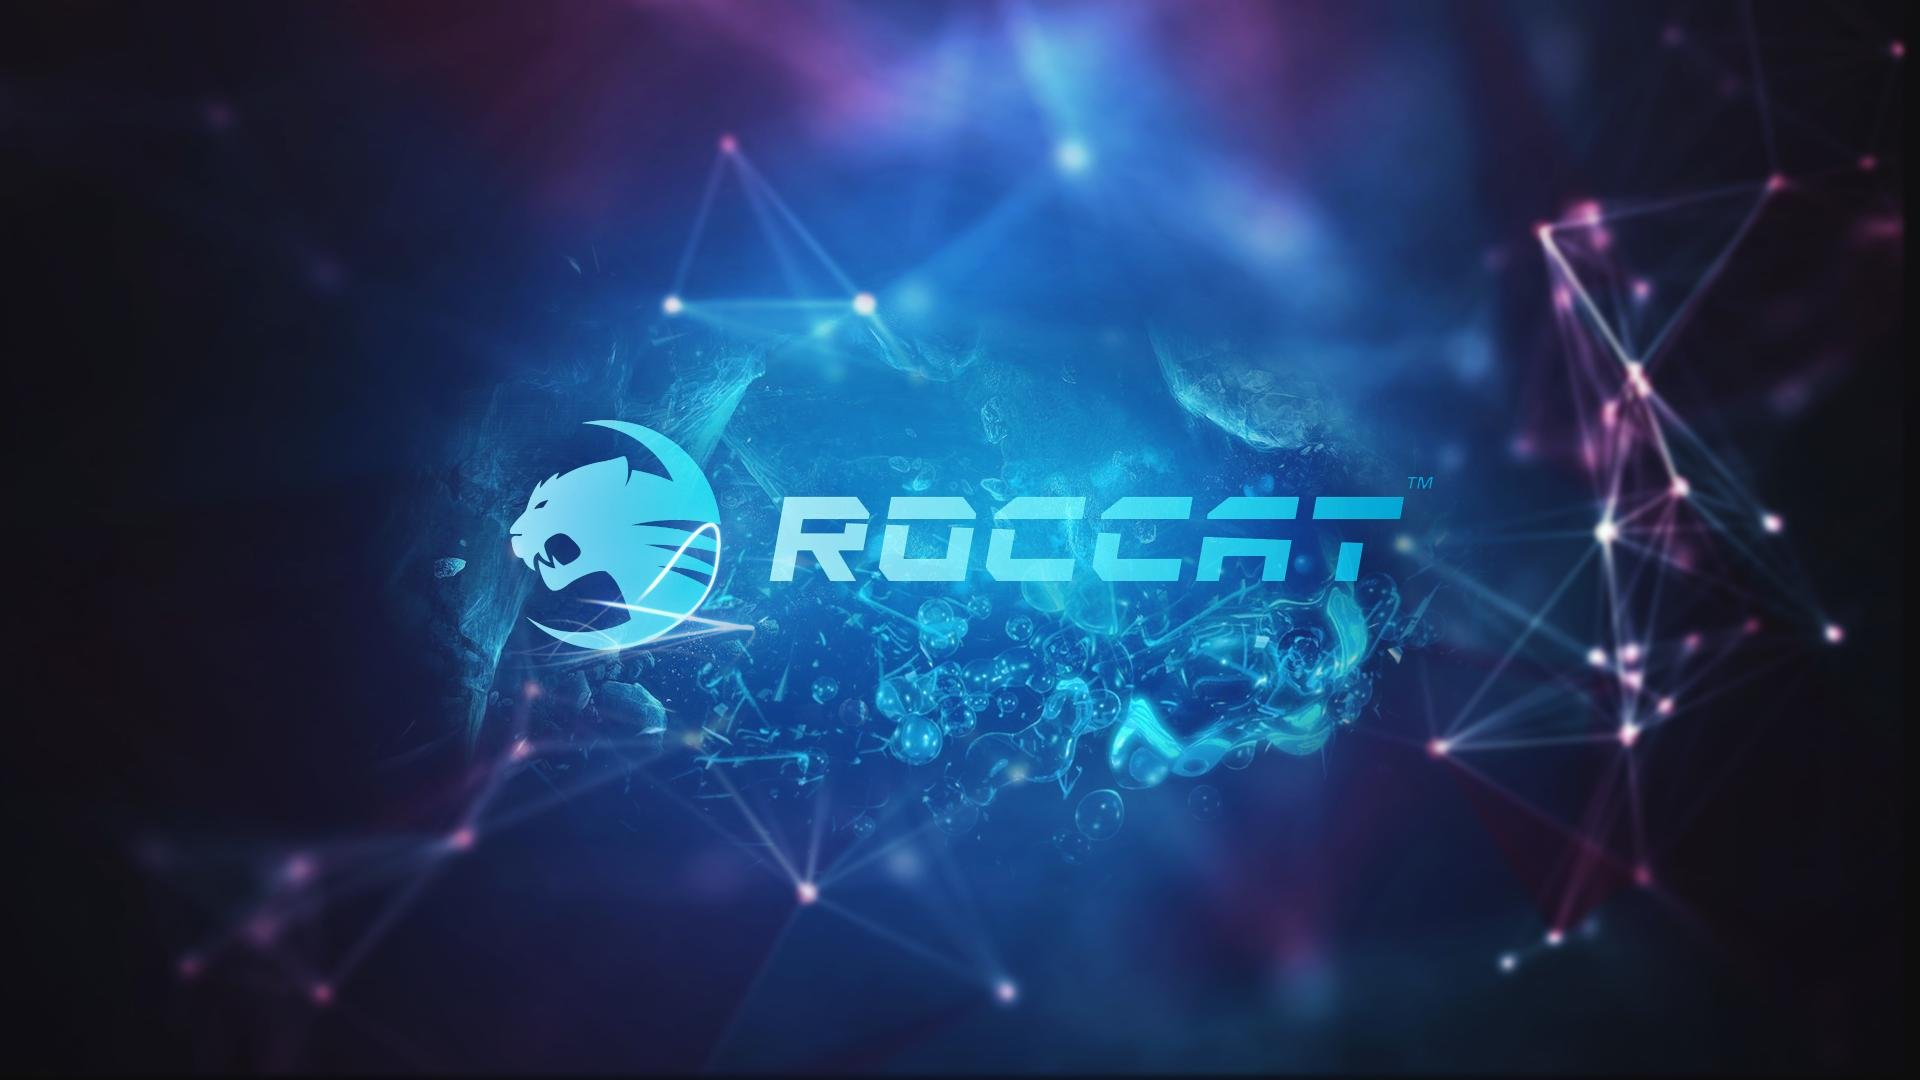 download roccat logo wallpaper - photo #15